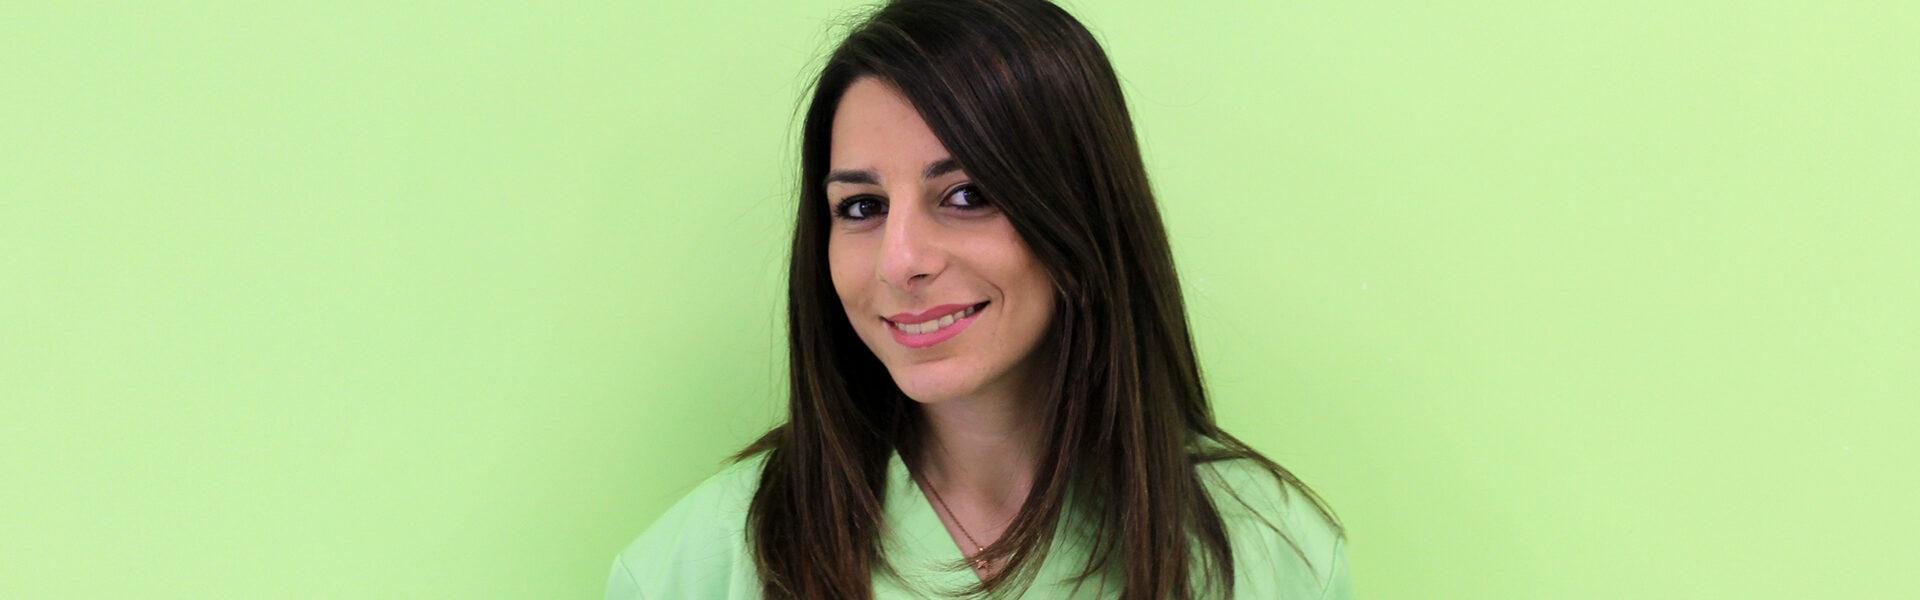 Valentina De Simone, Neuropsicomotricista